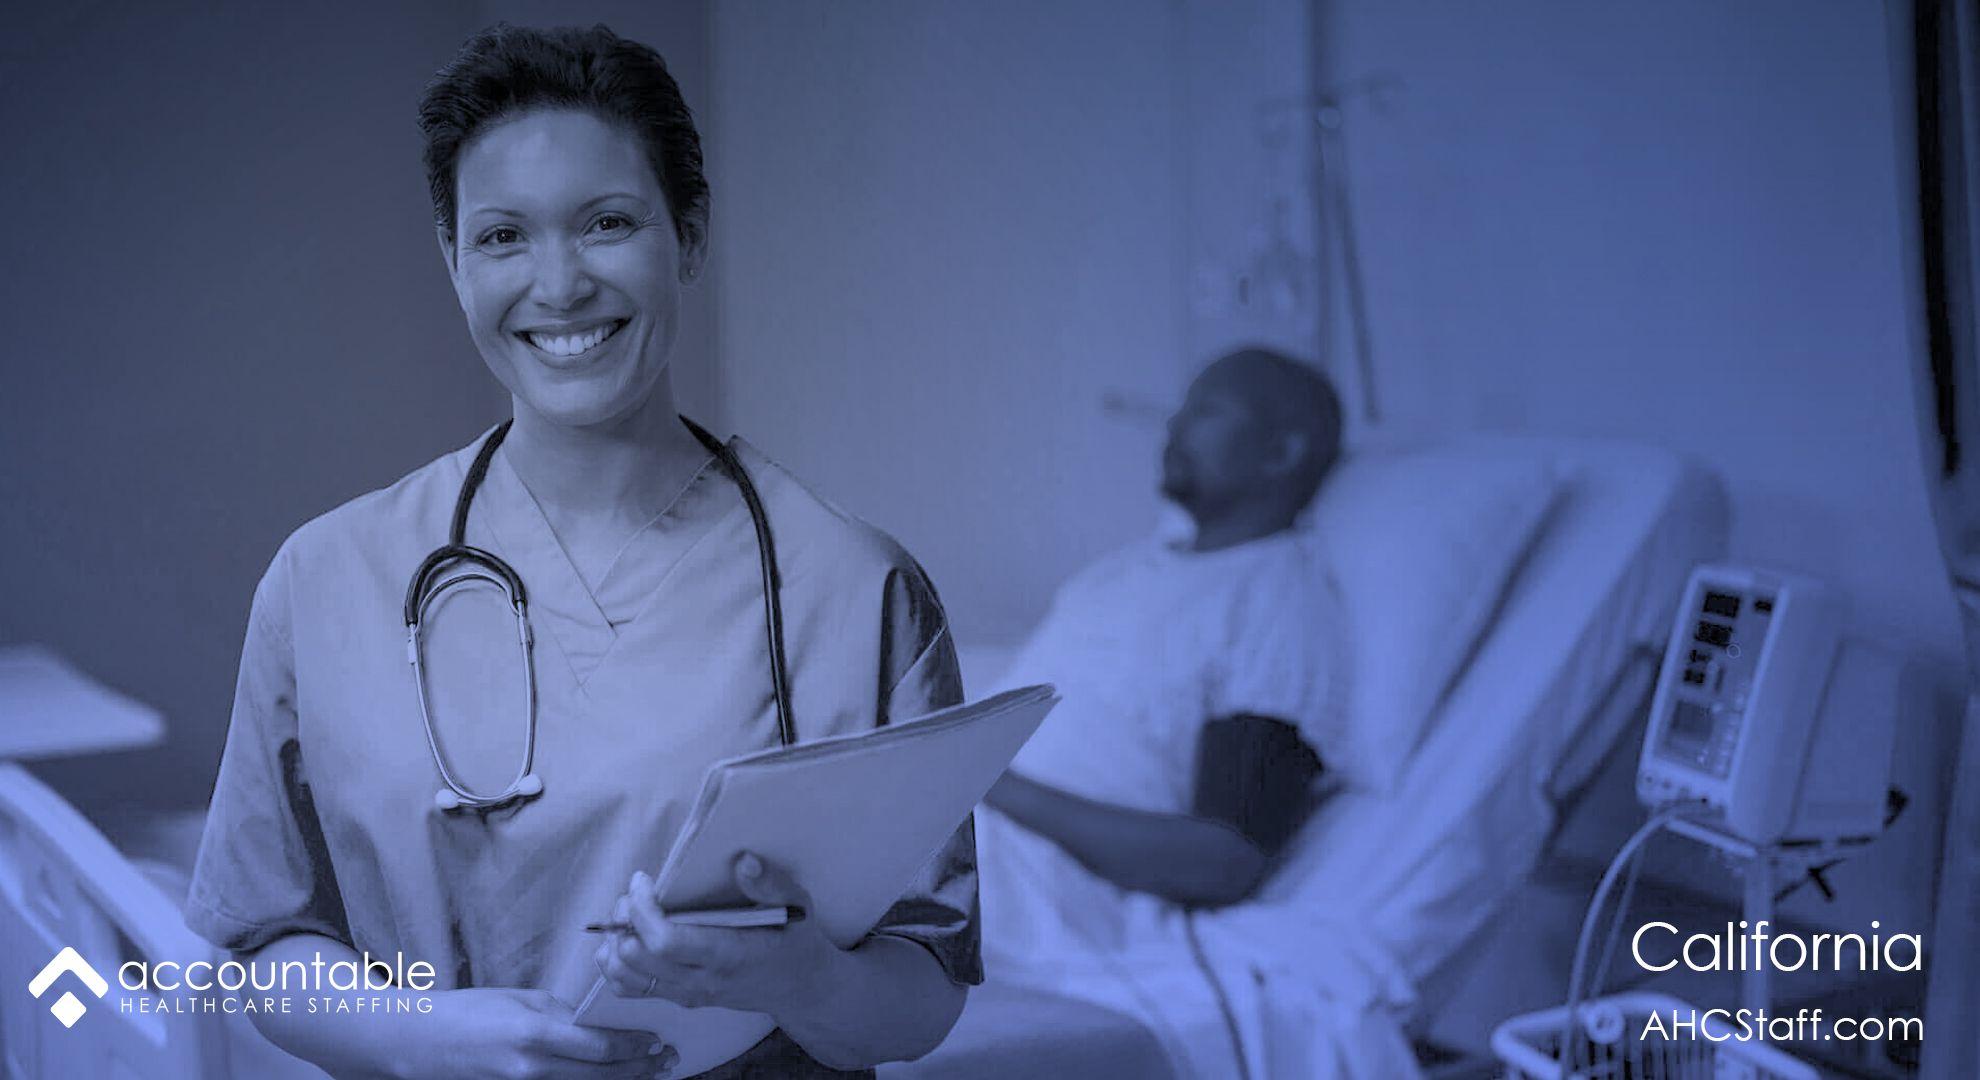 California Nurse jobs Nursing jobs, Travel nursing